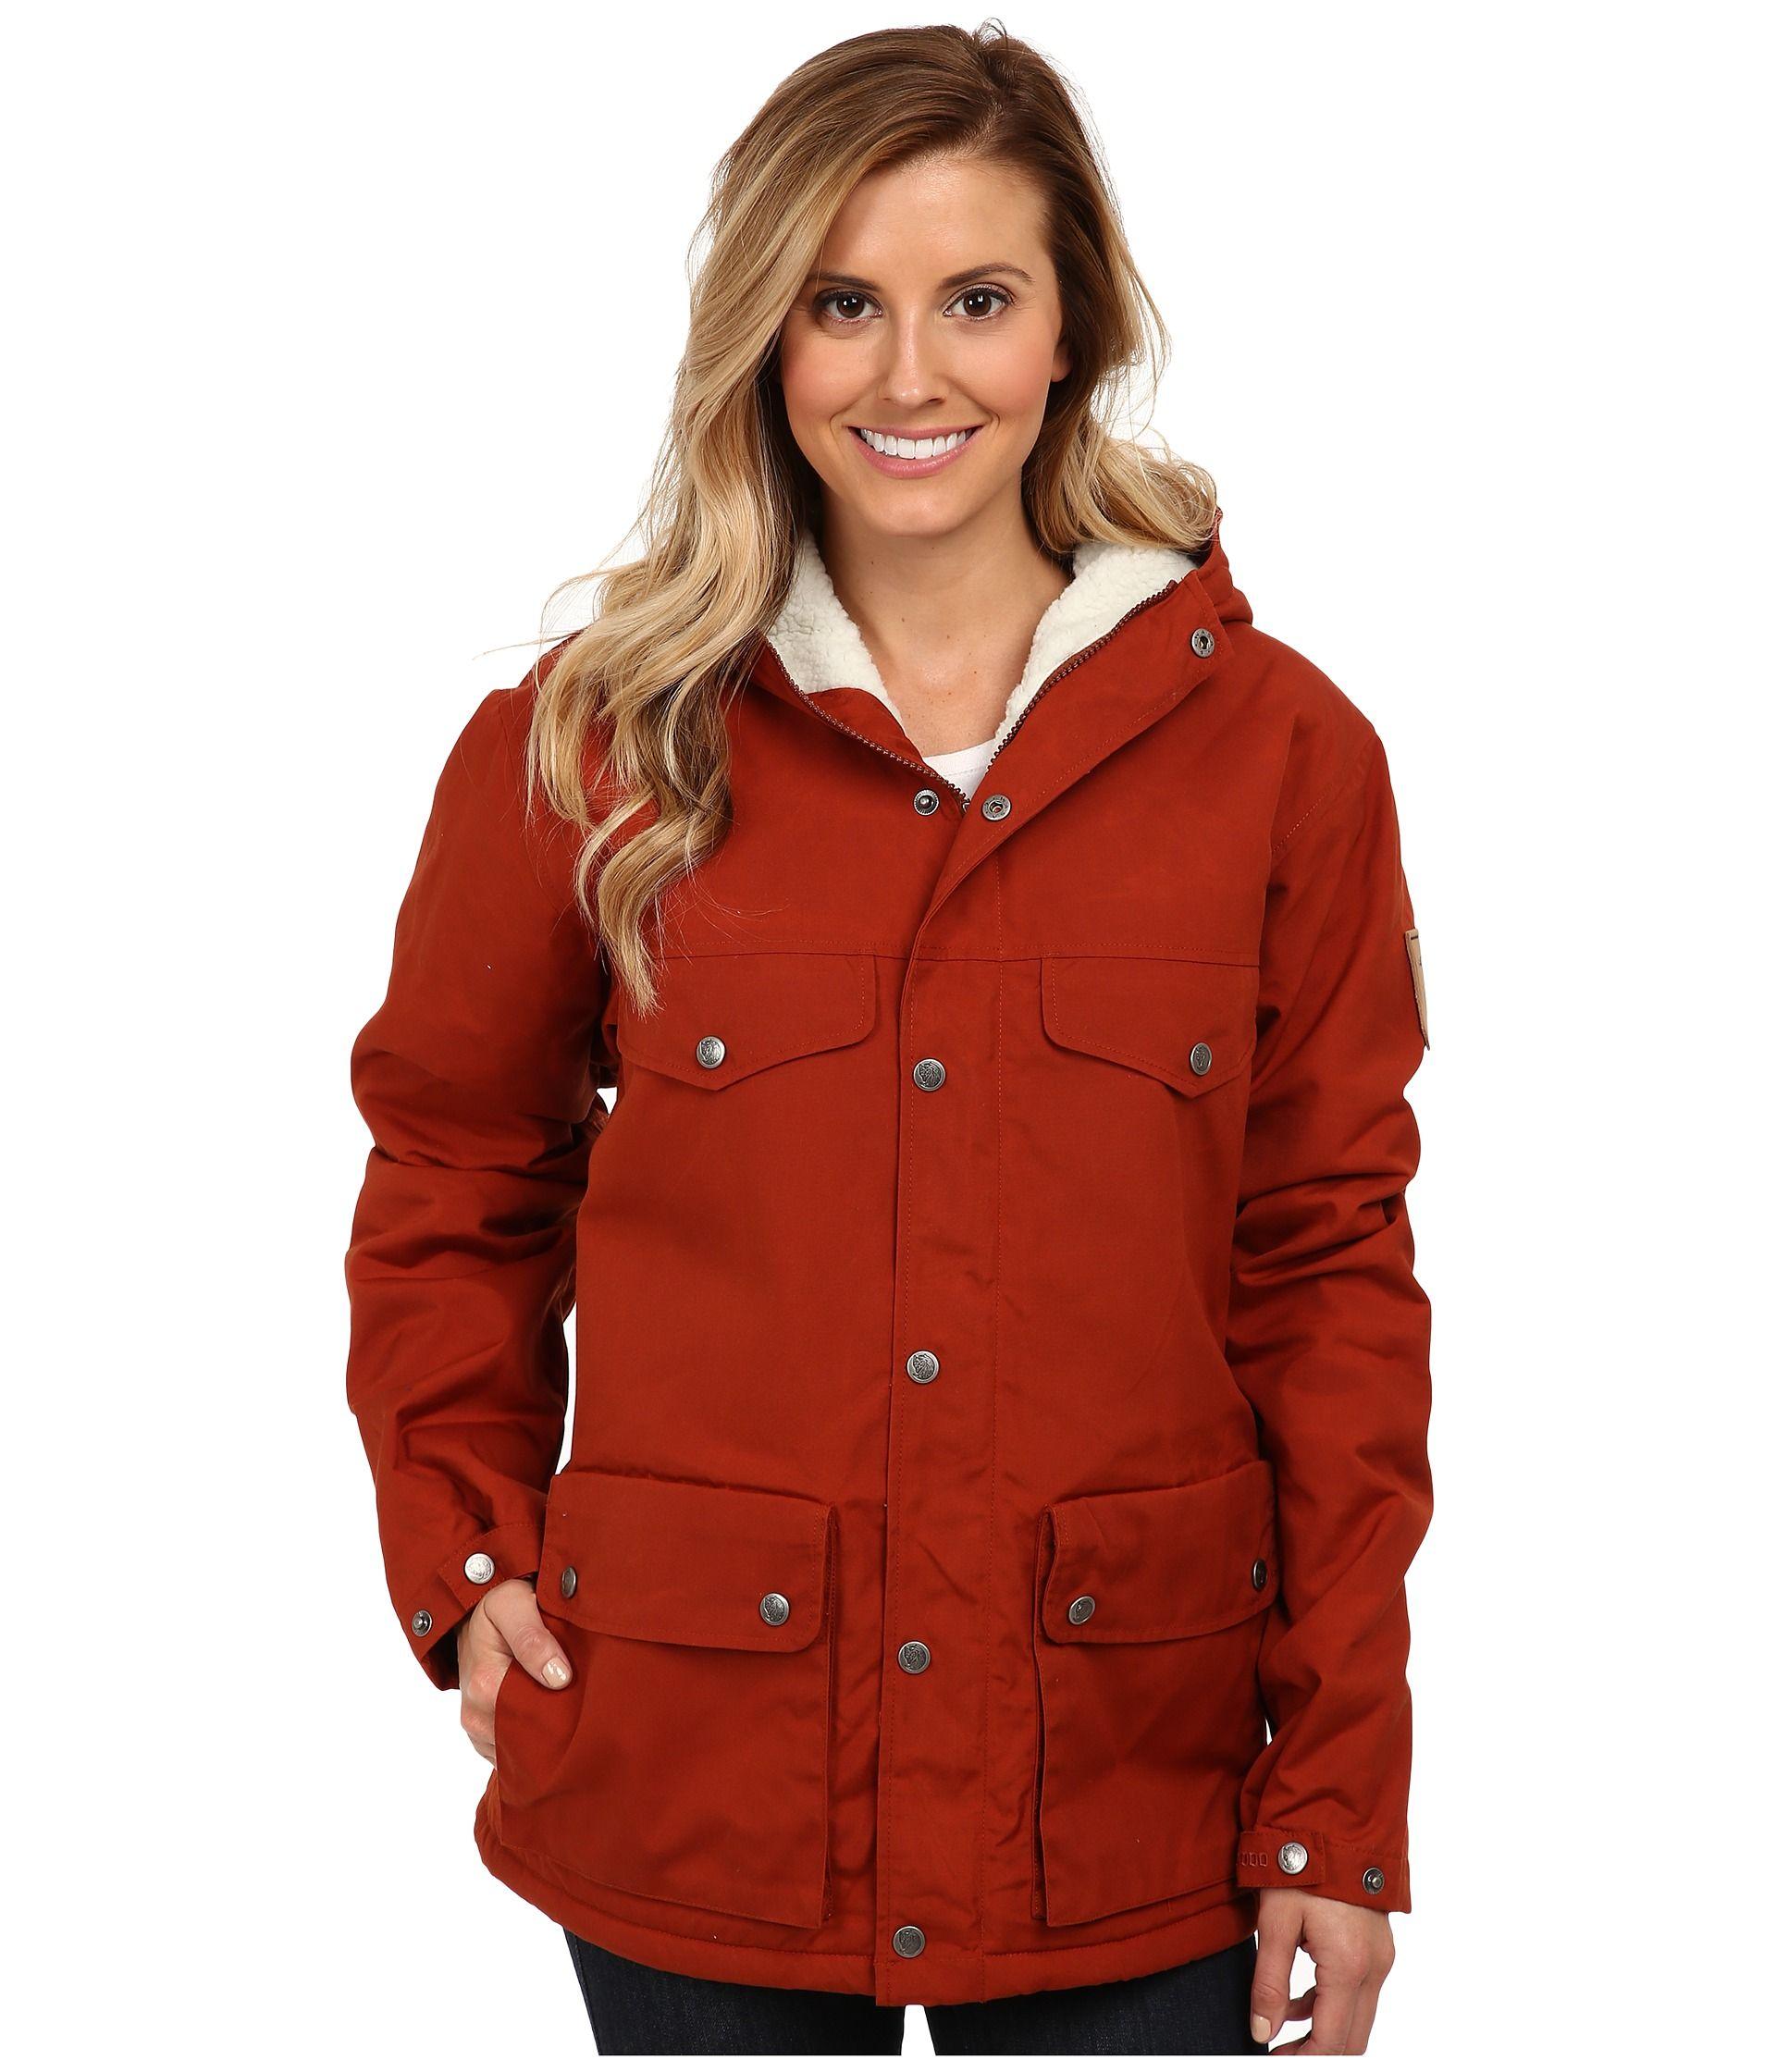 Fjallraven Greenland Winter Jacket Winter Jackets Women Jackets Winter Jackets